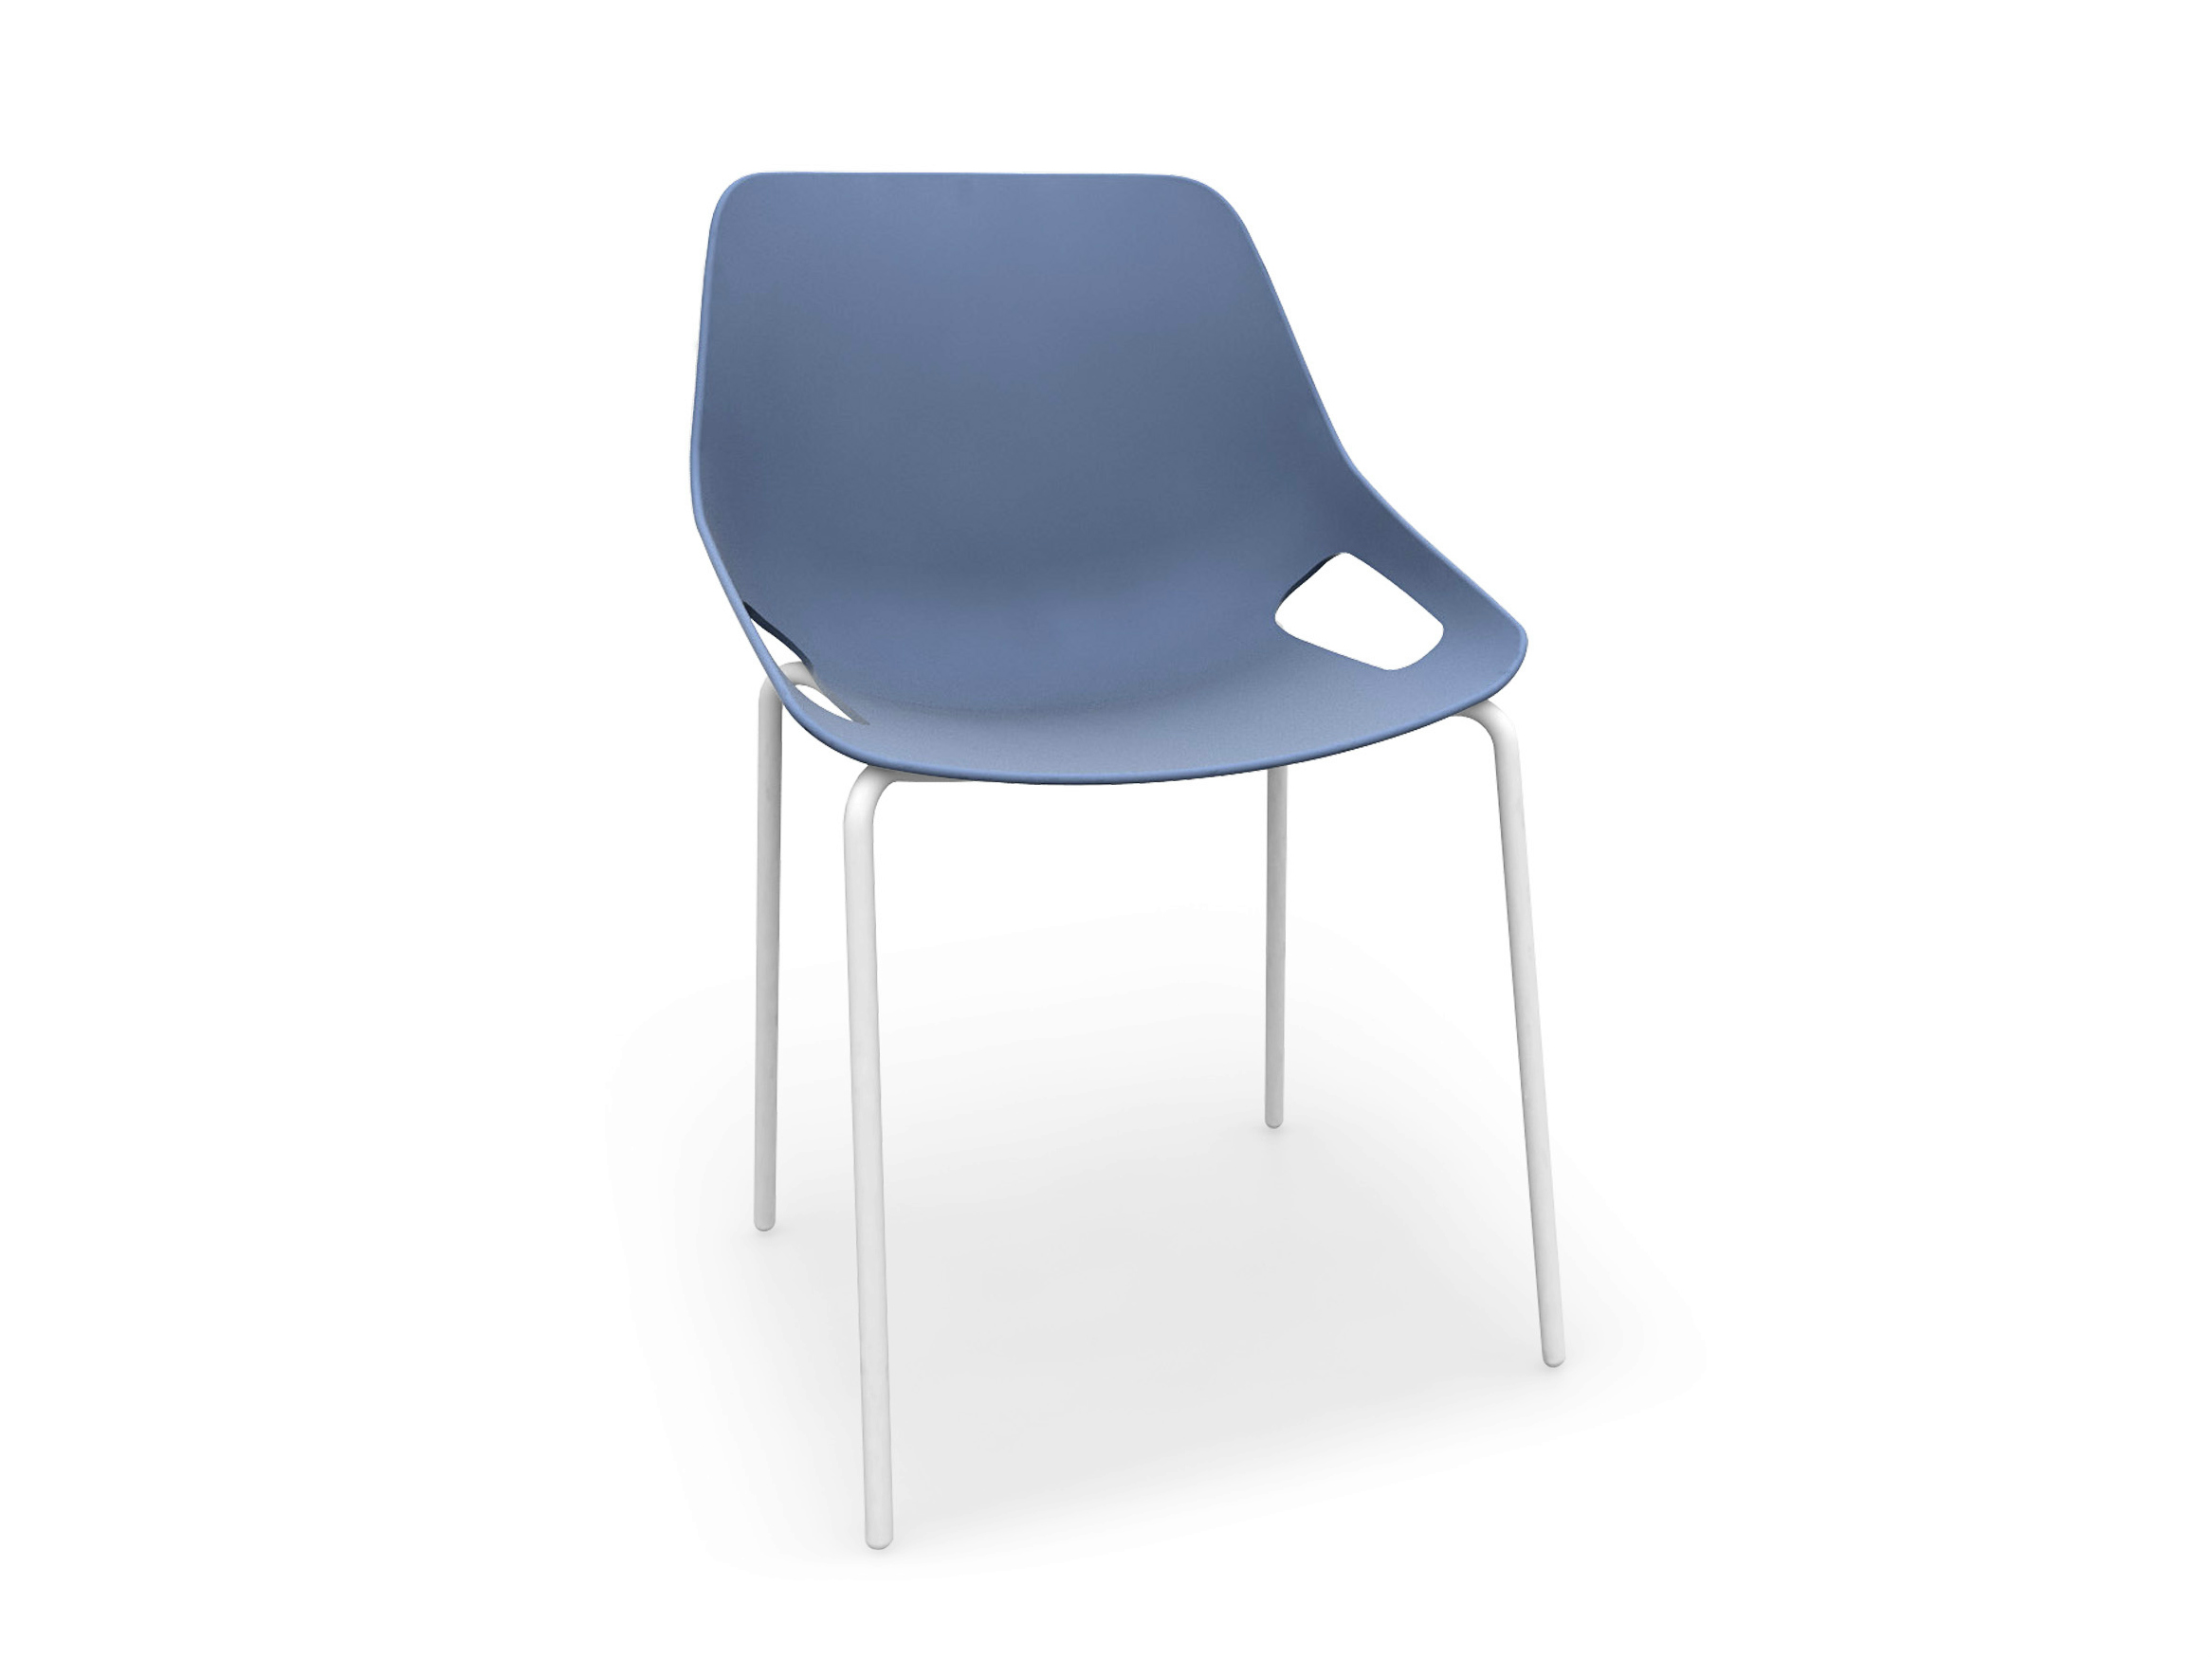 PURE LOOP MAXI | Chair Pure Loop Series By Infiniti design Claus Breinholt